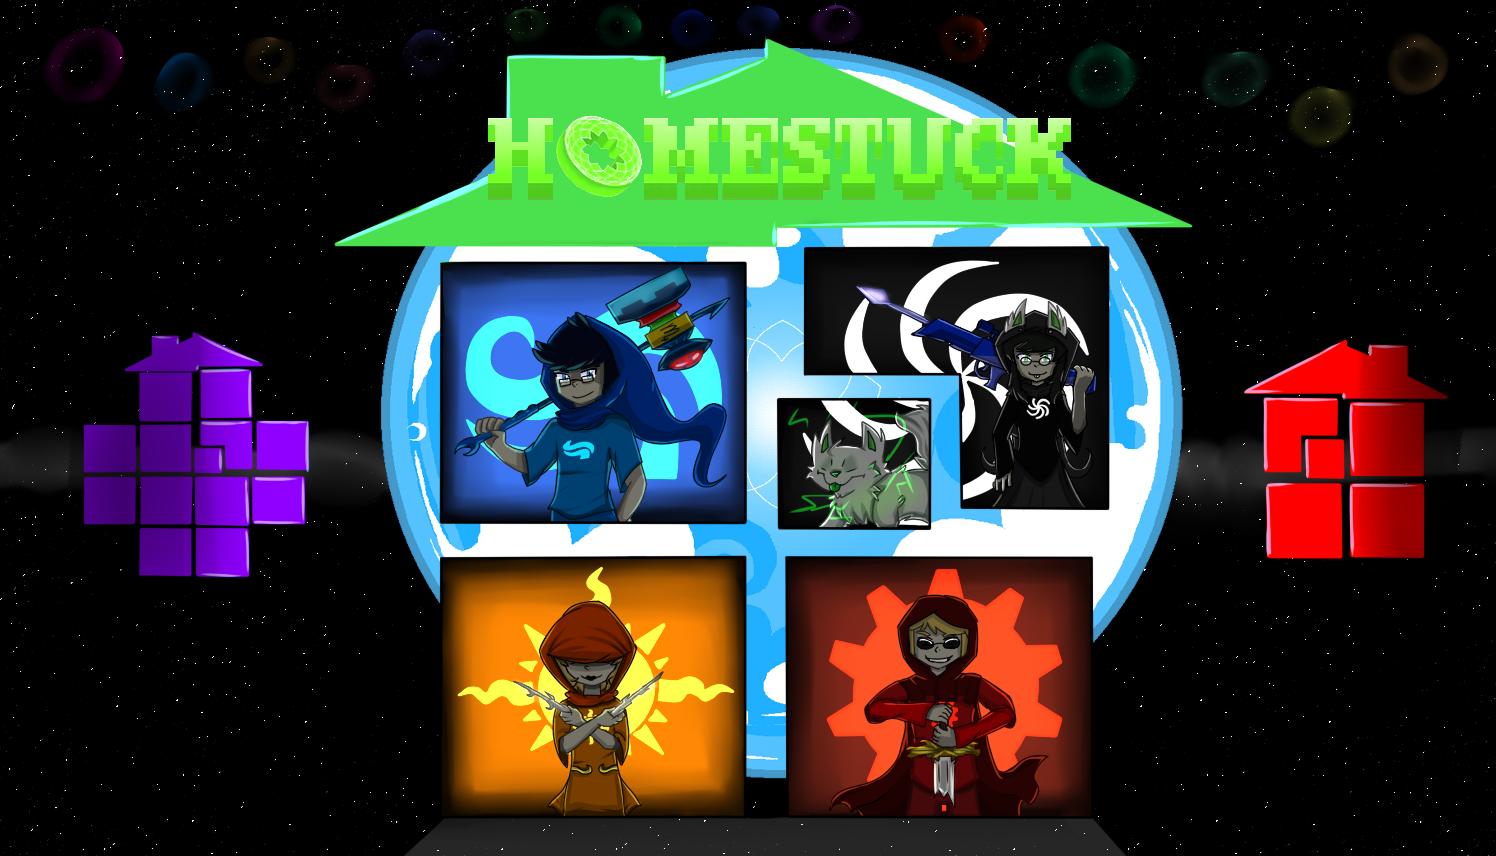 homestuck logo wallpaper - photo #23